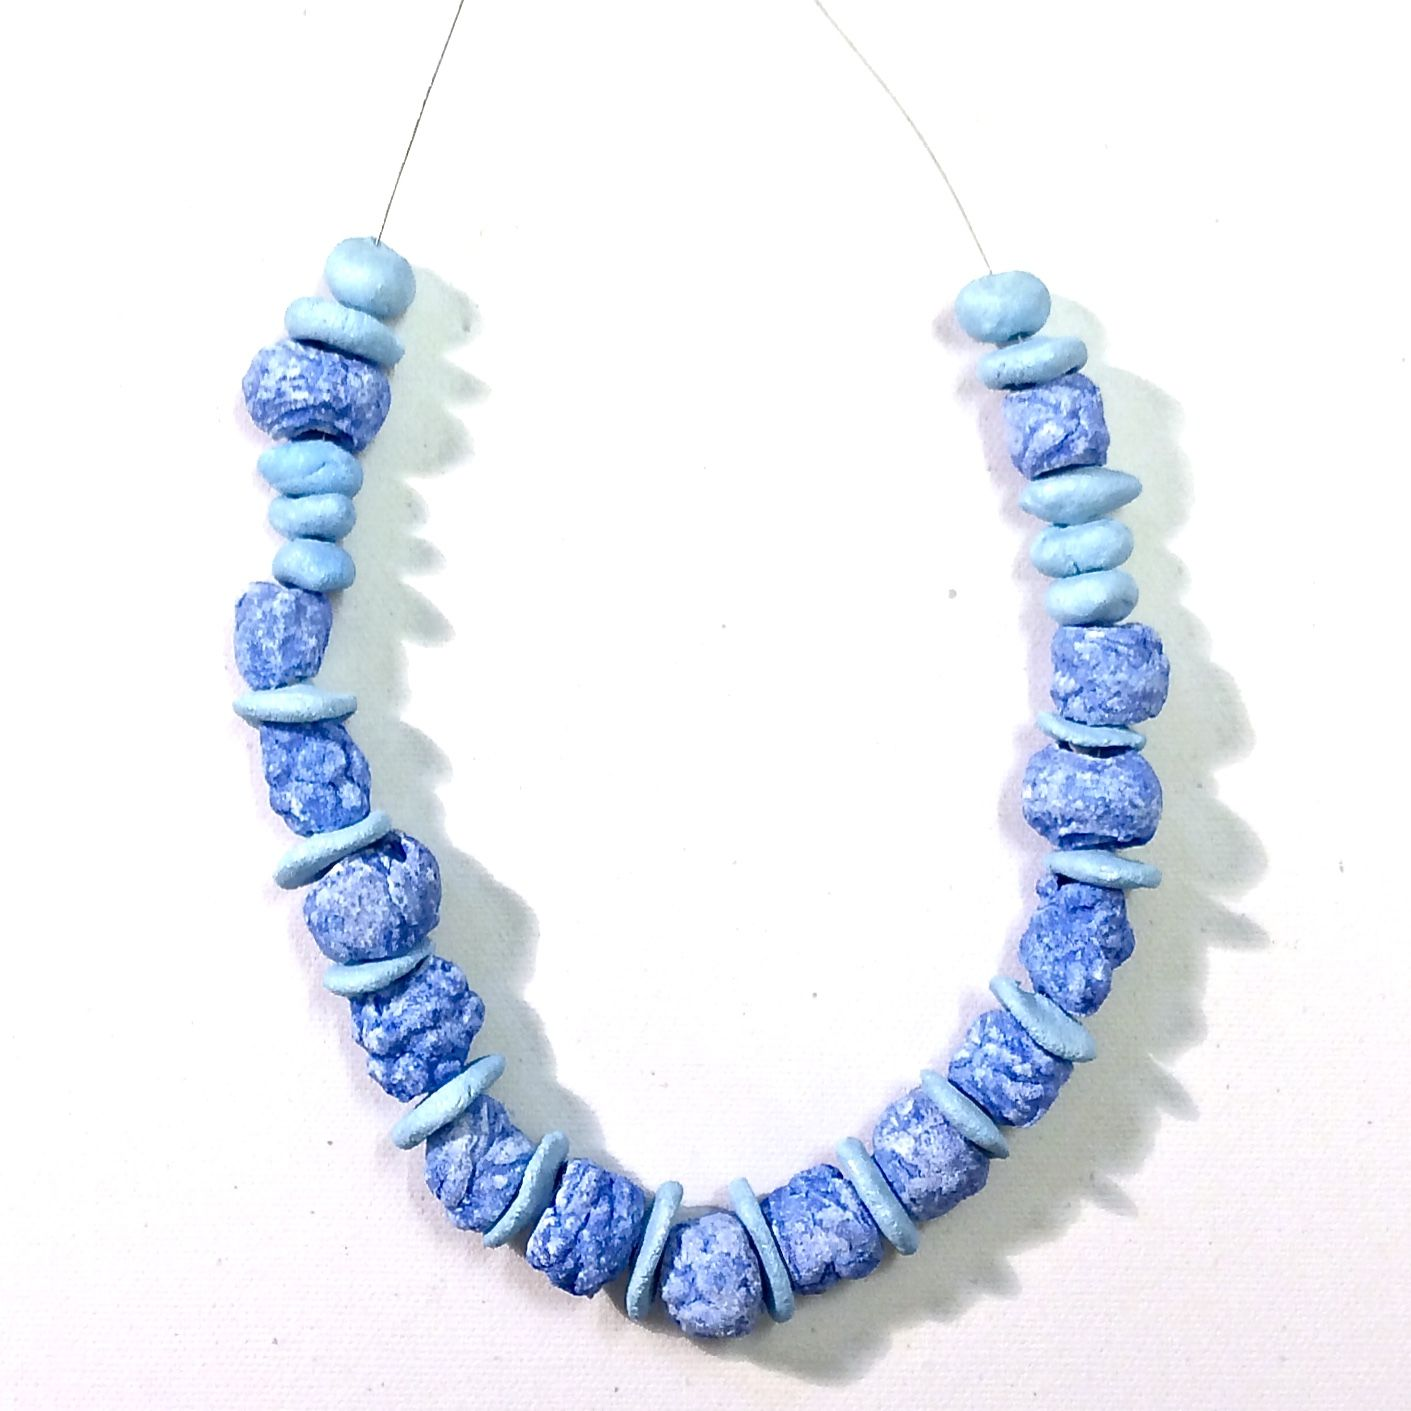 Paper Mache Jewellery Paper Jewelry Jewelry Artistic Jewelry